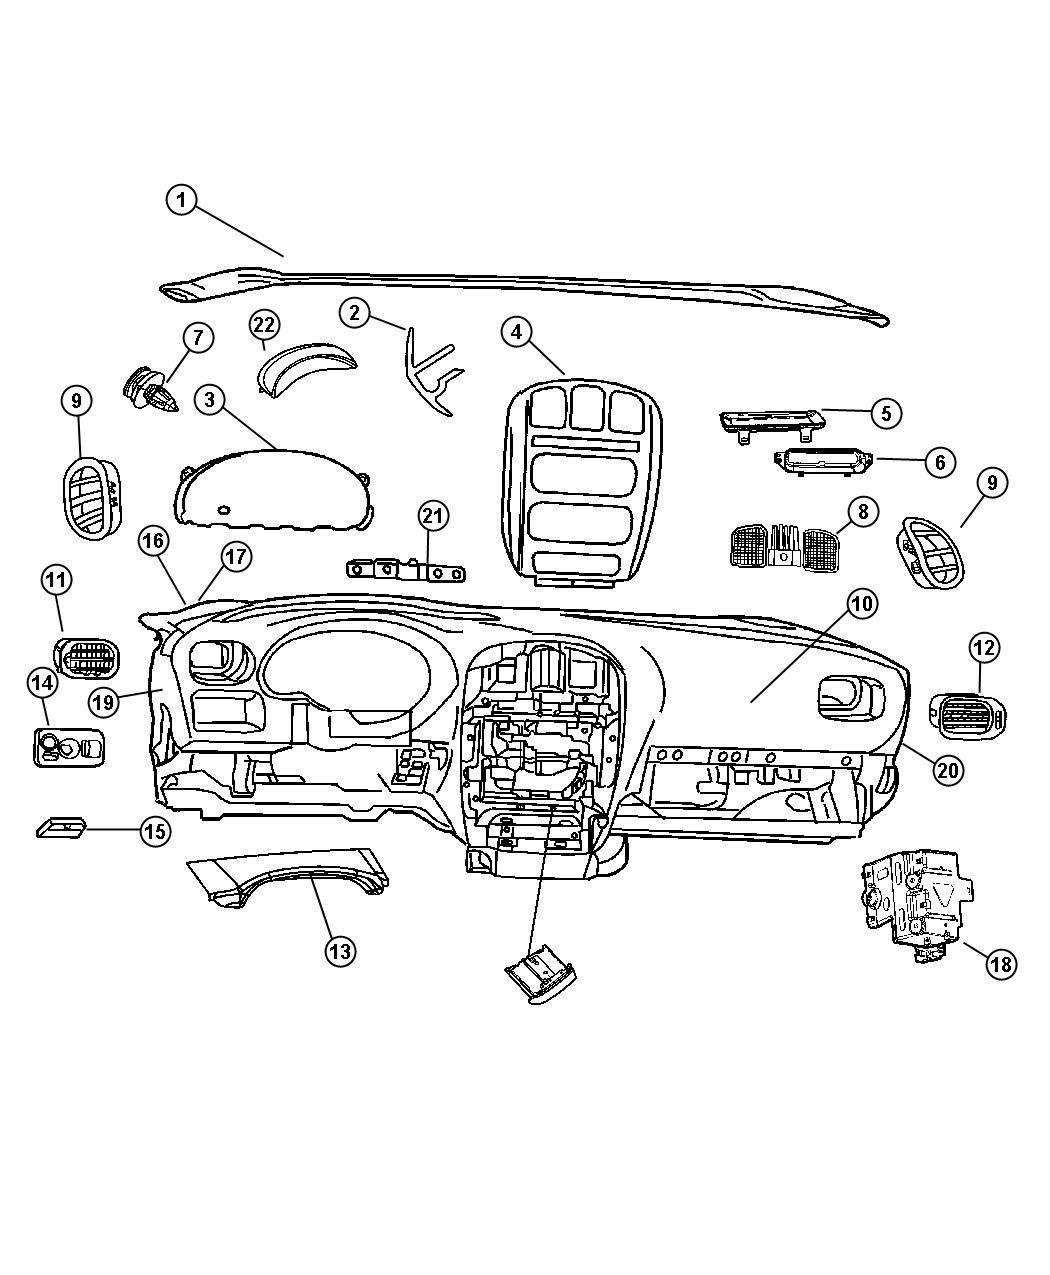 1999 Jeep Grand Cherokee BASE 4.0L Power Tech I6 Fastener